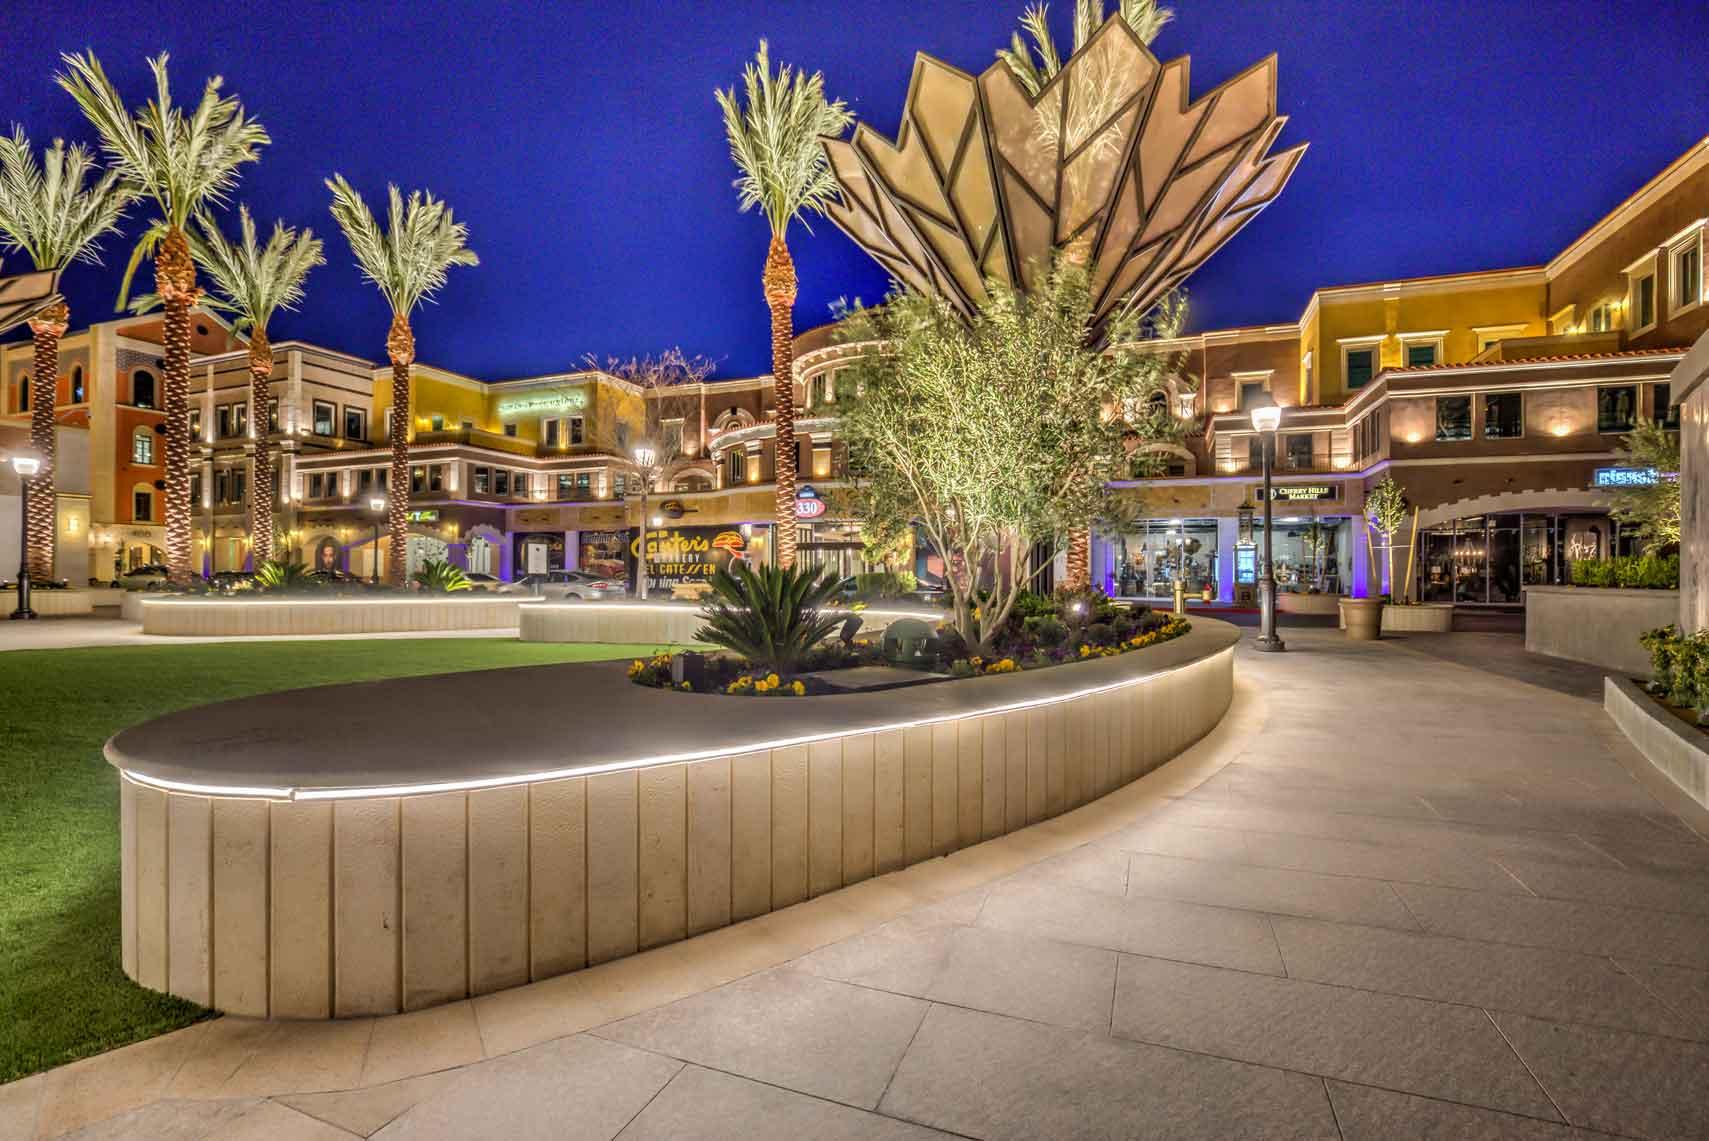 Tivoli-Village-Courtyard